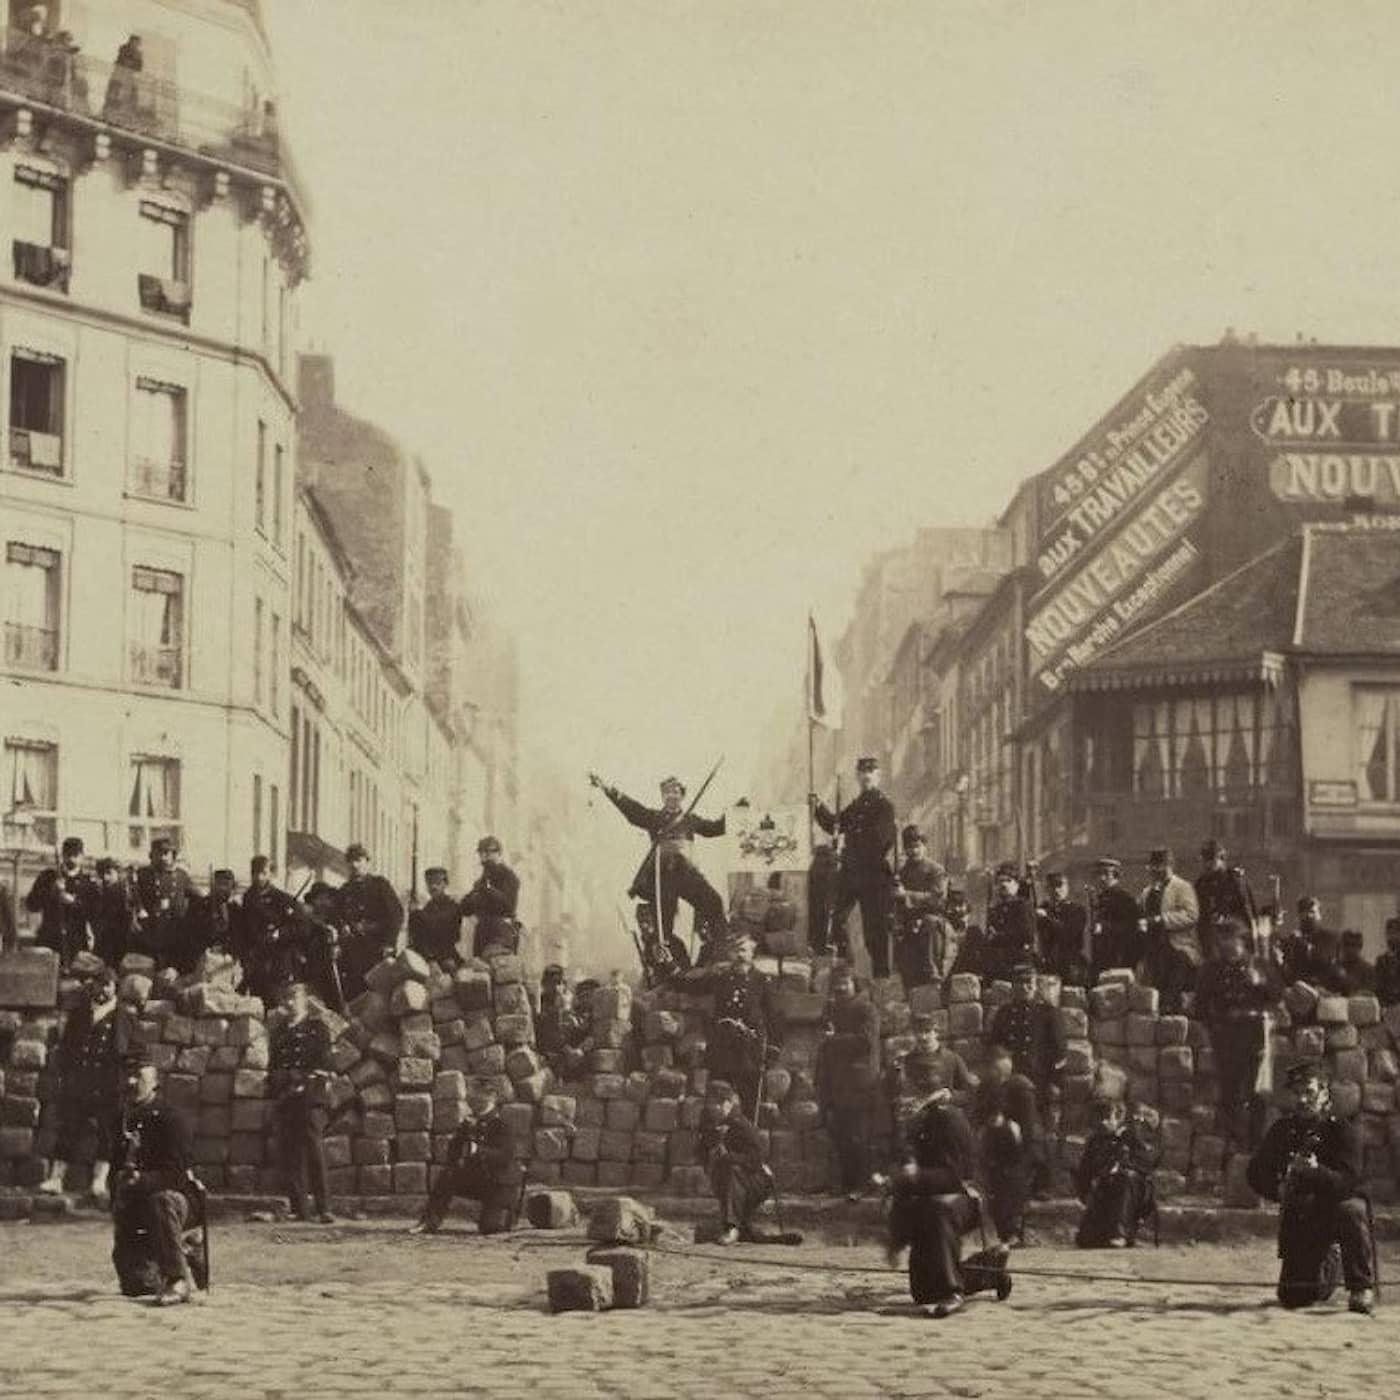 Pariskommunen – socialismens blodiga experiment